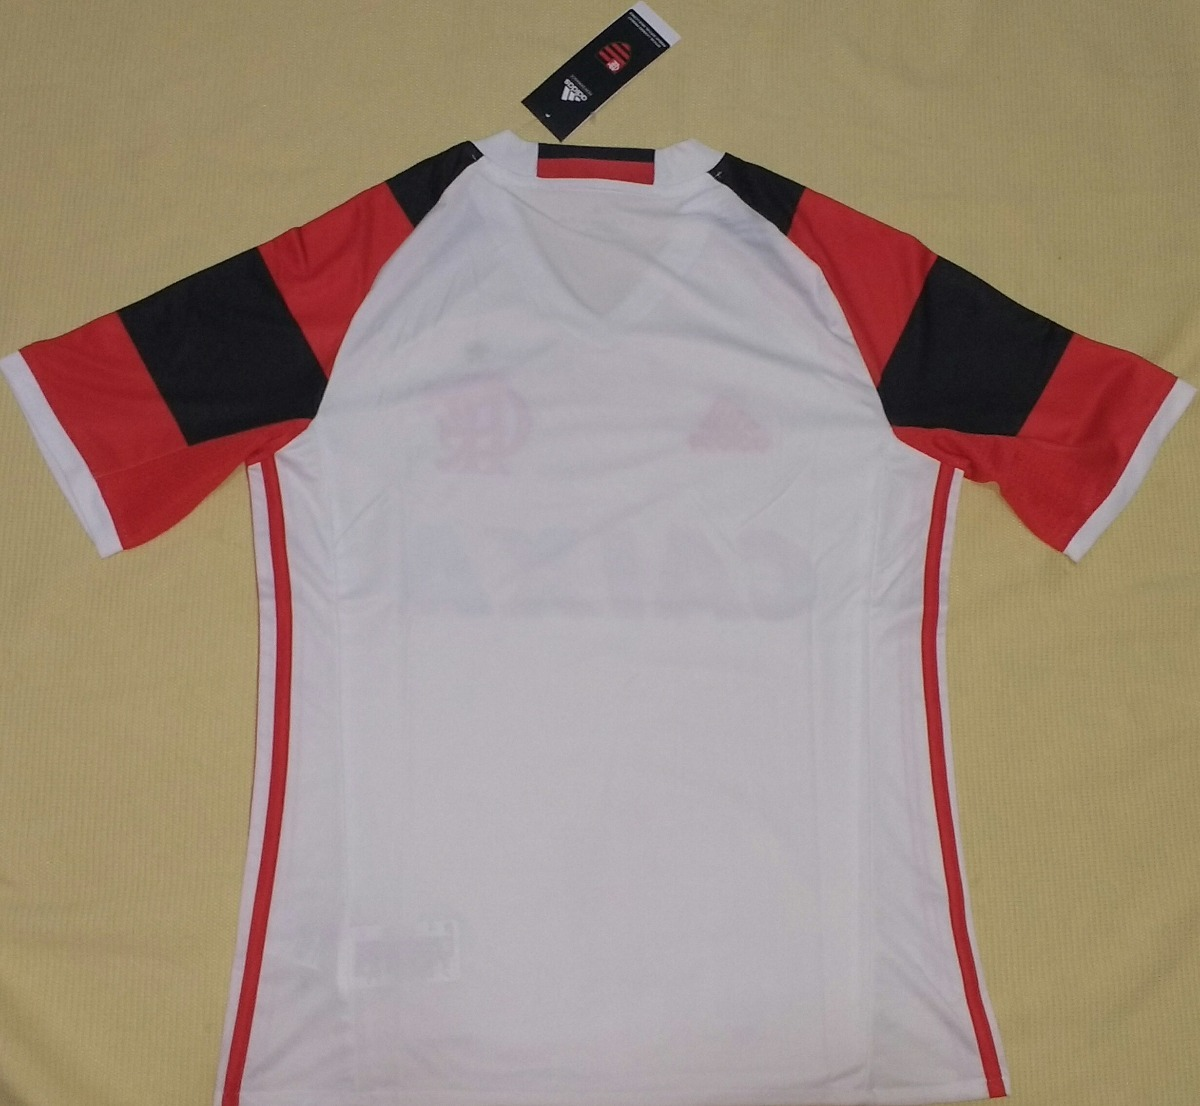 fffe9ebe73 Camisa Flamengo Feminina Original 100% adidas - 27 - R  129